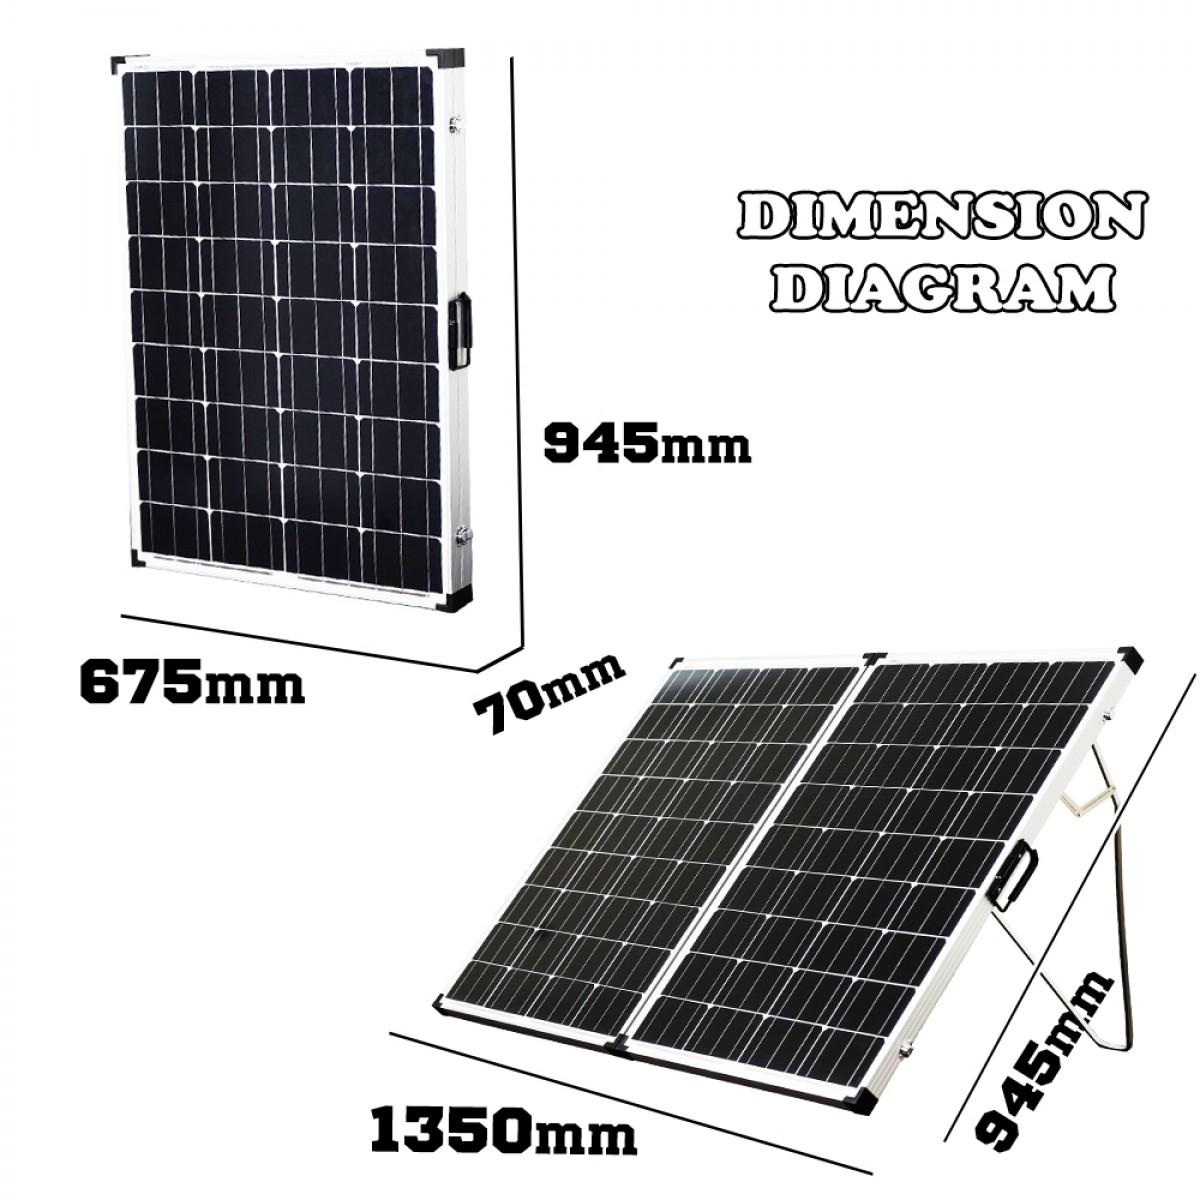 12v 250w Folding Solar Panel Kit Caravan Boat Camping Power Mono Charging Home